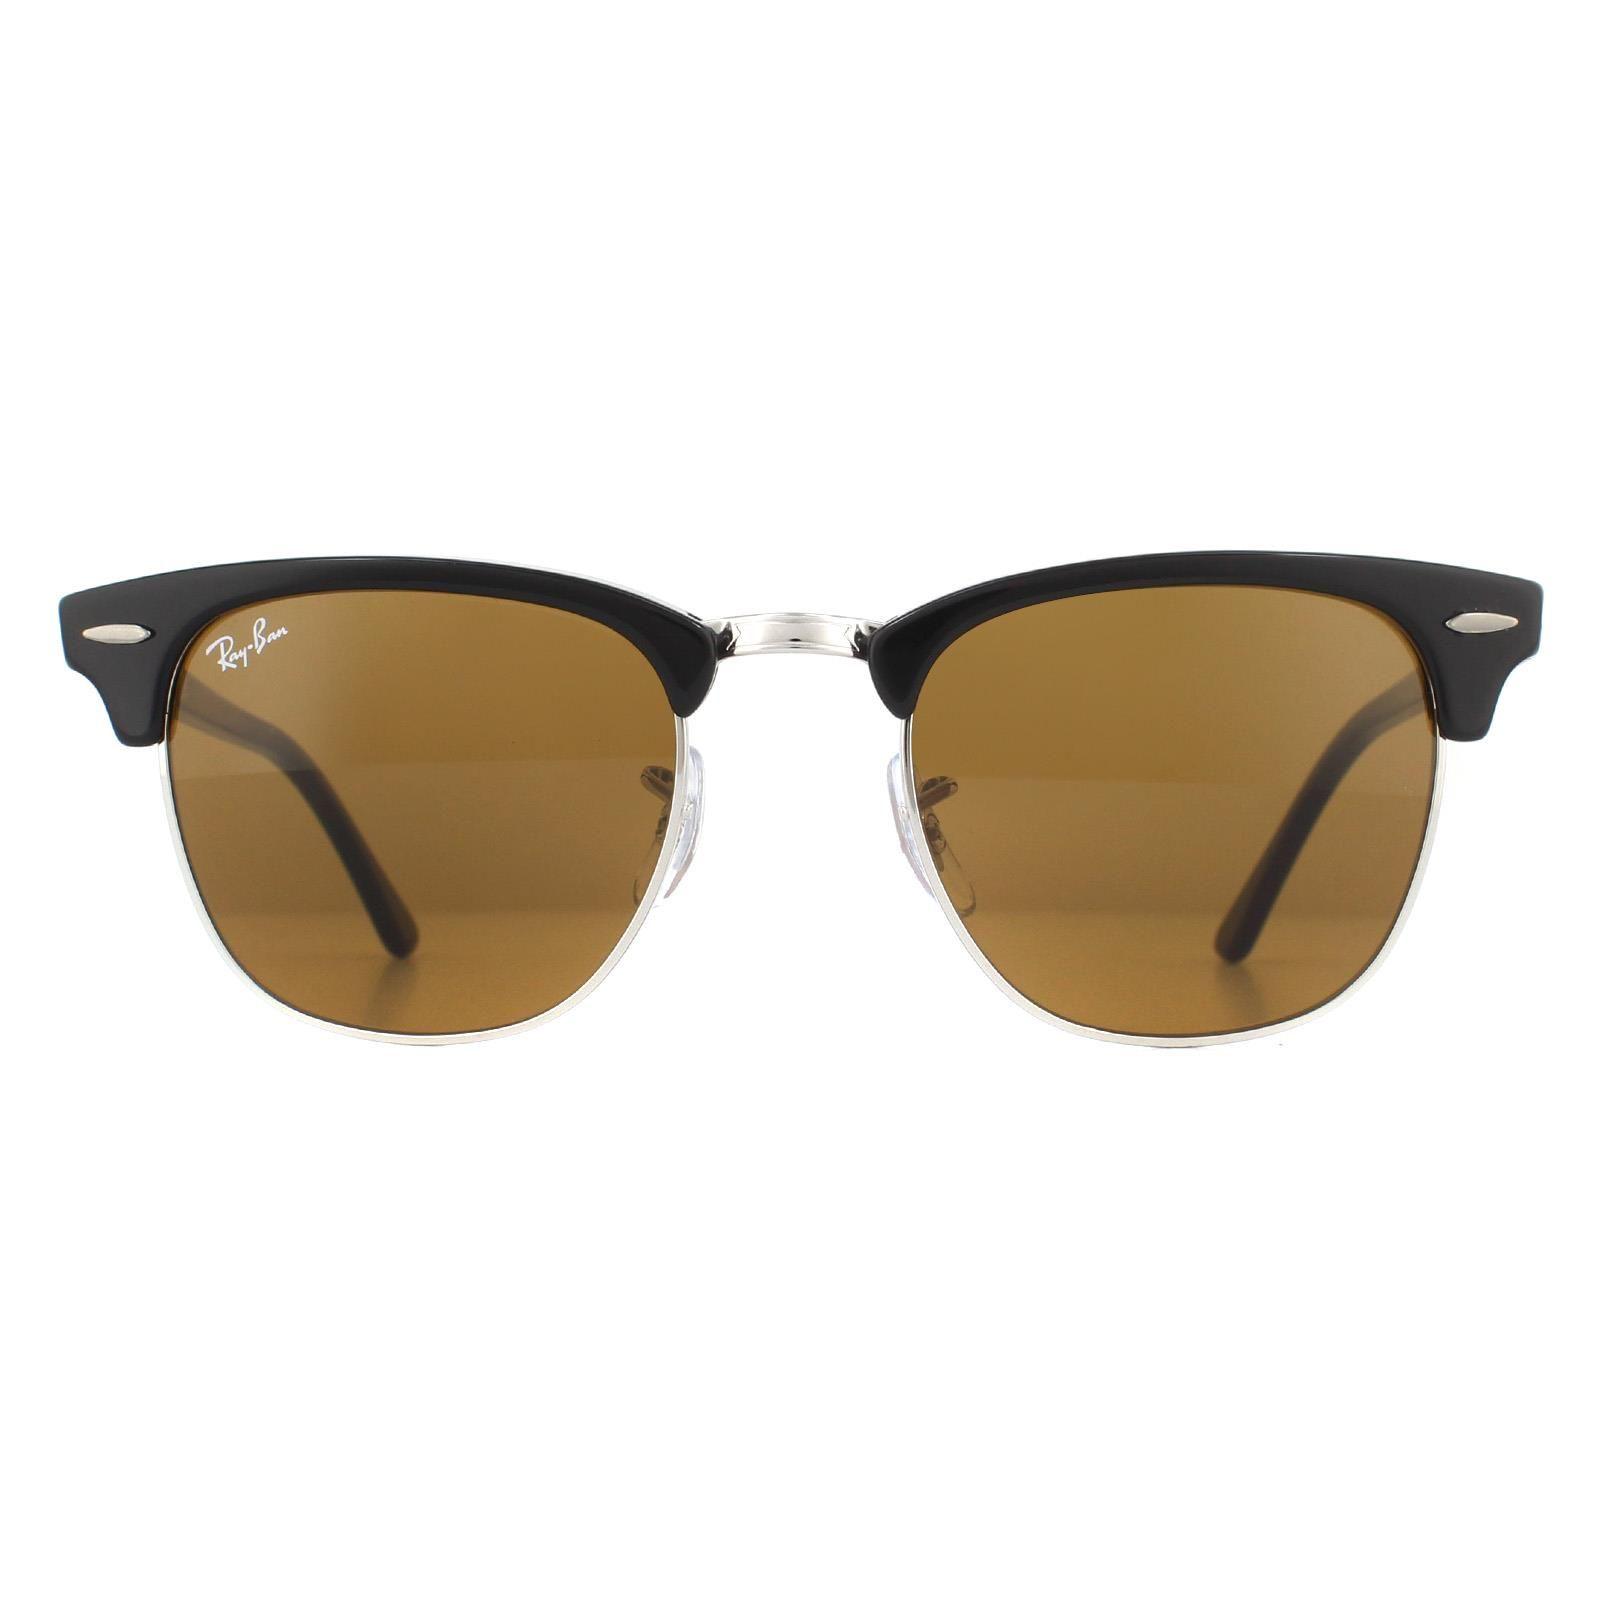 Ray-Ban Sunglasses Clubmaster 3016 W3387 Black Brown B-15 49mm